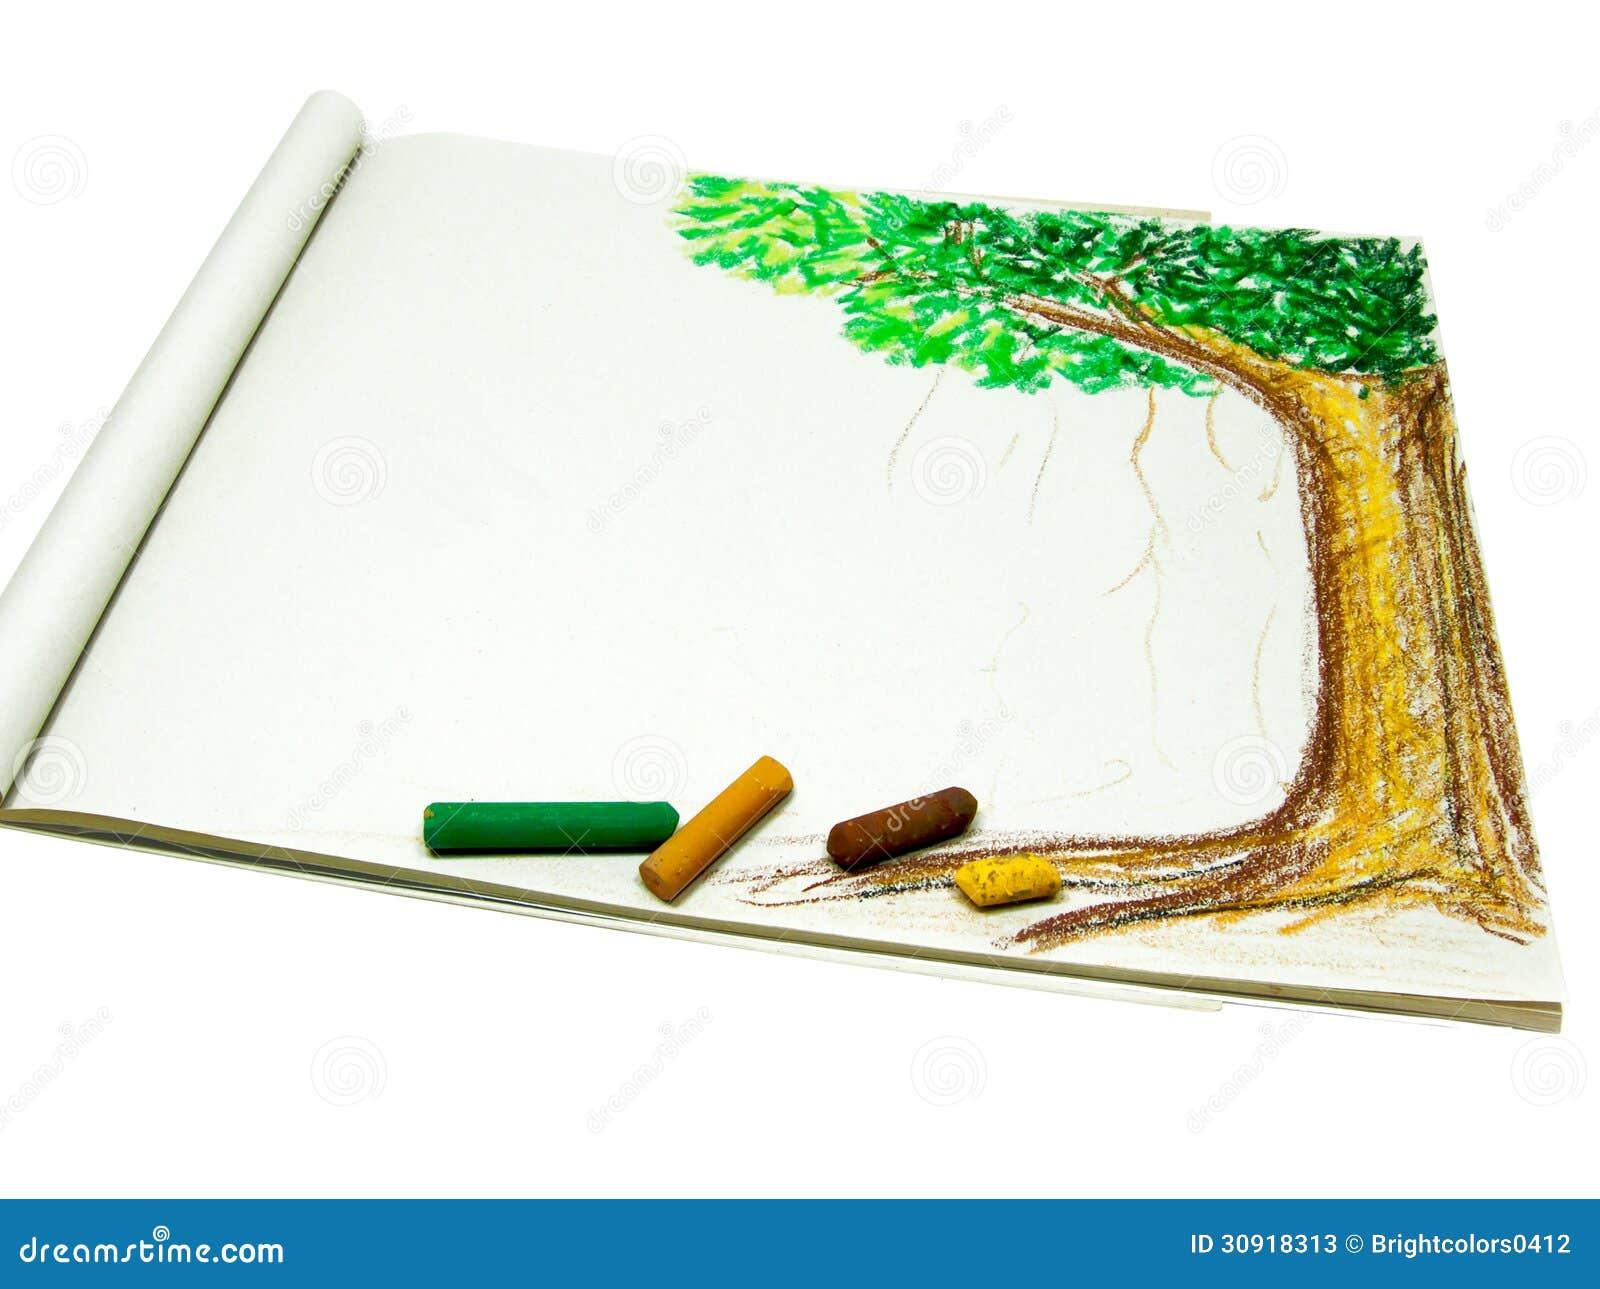 Dessin d 39 arbre avec le crayon image stock image 30918313 - Dessins d arbre ...